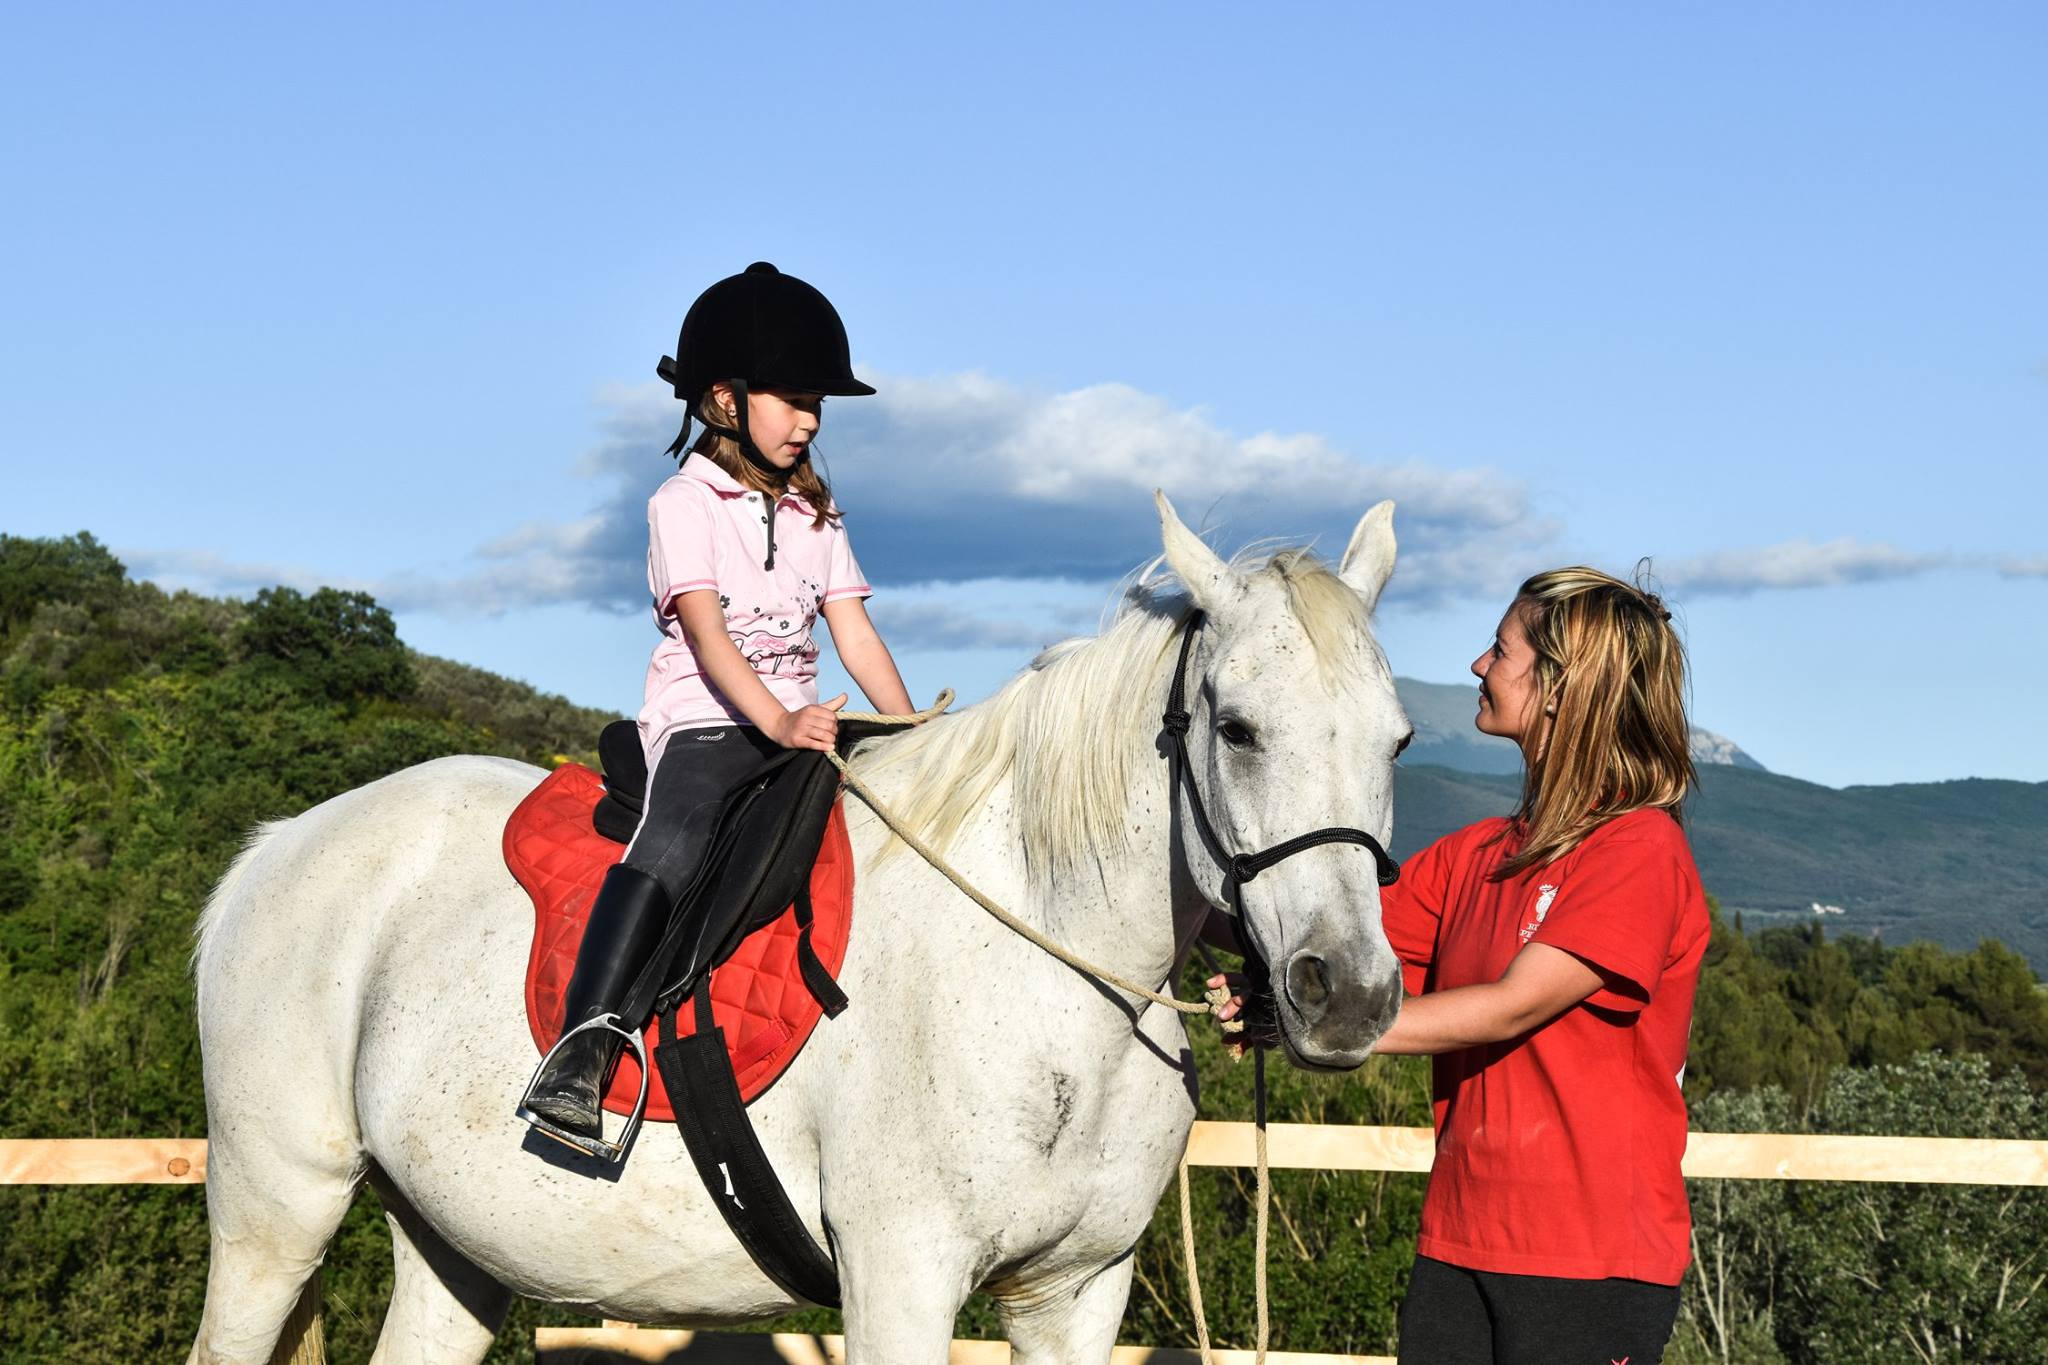 Agriturismo con cavalli e animali a Spoleto